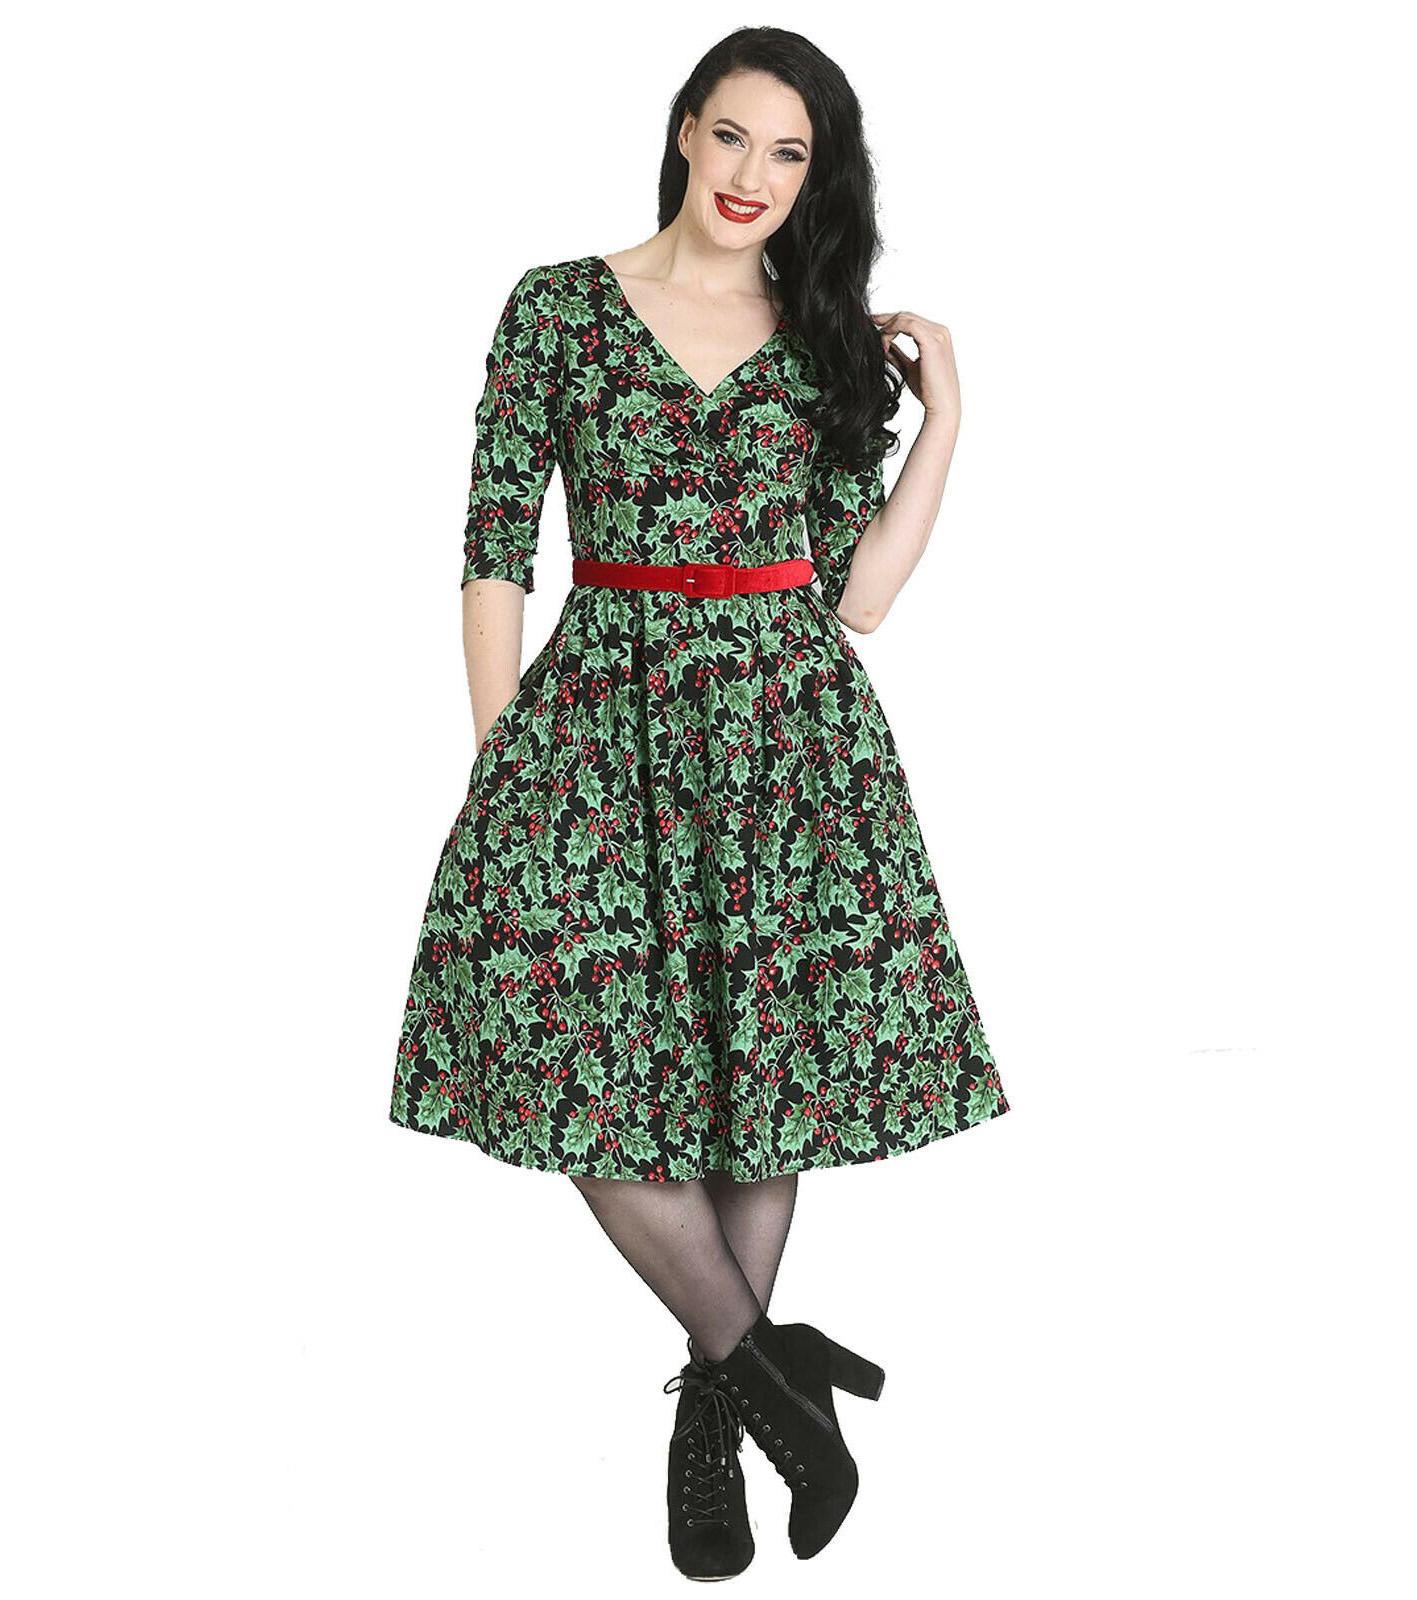 Hell-Bunny-50s-Pin-Up-Navidad-Vestido-Festivo-Rojo-Holly-Berry-Negro-Todos-los-Tamanos miniatura 19